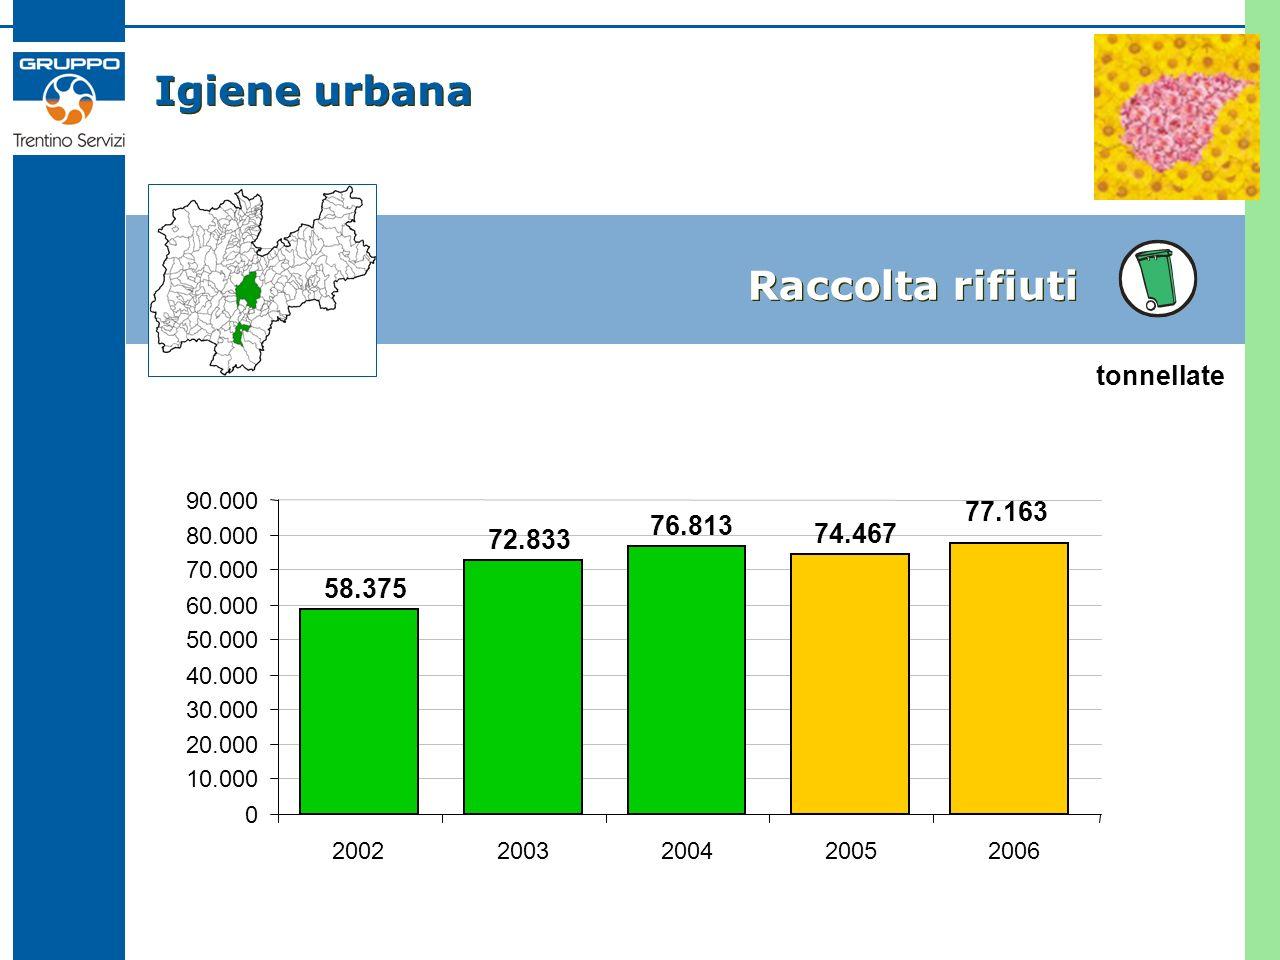 Igiene urbana Raccolta rifiuti 58.375 72.833 76.813 74.467 0 10.000 20.000 30.000 40.000 50.000 60.000 70.000 80.000 90.000 2002200320042005 tonnellate 77.163 2006